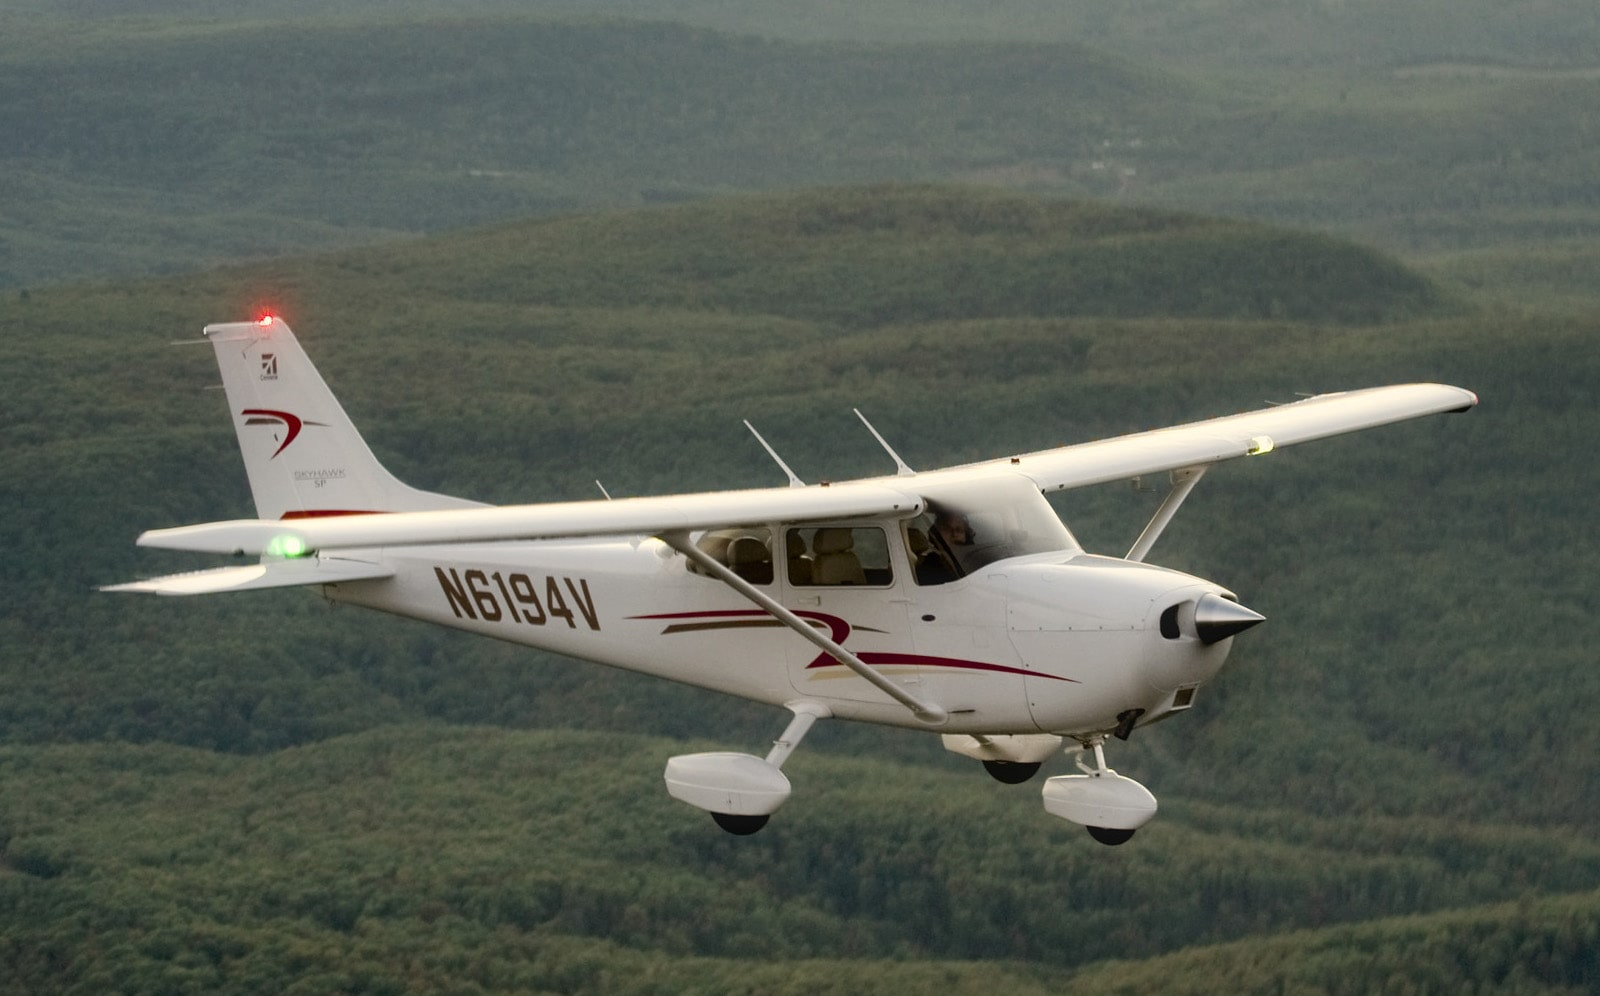 Skyhawk3 super large size min